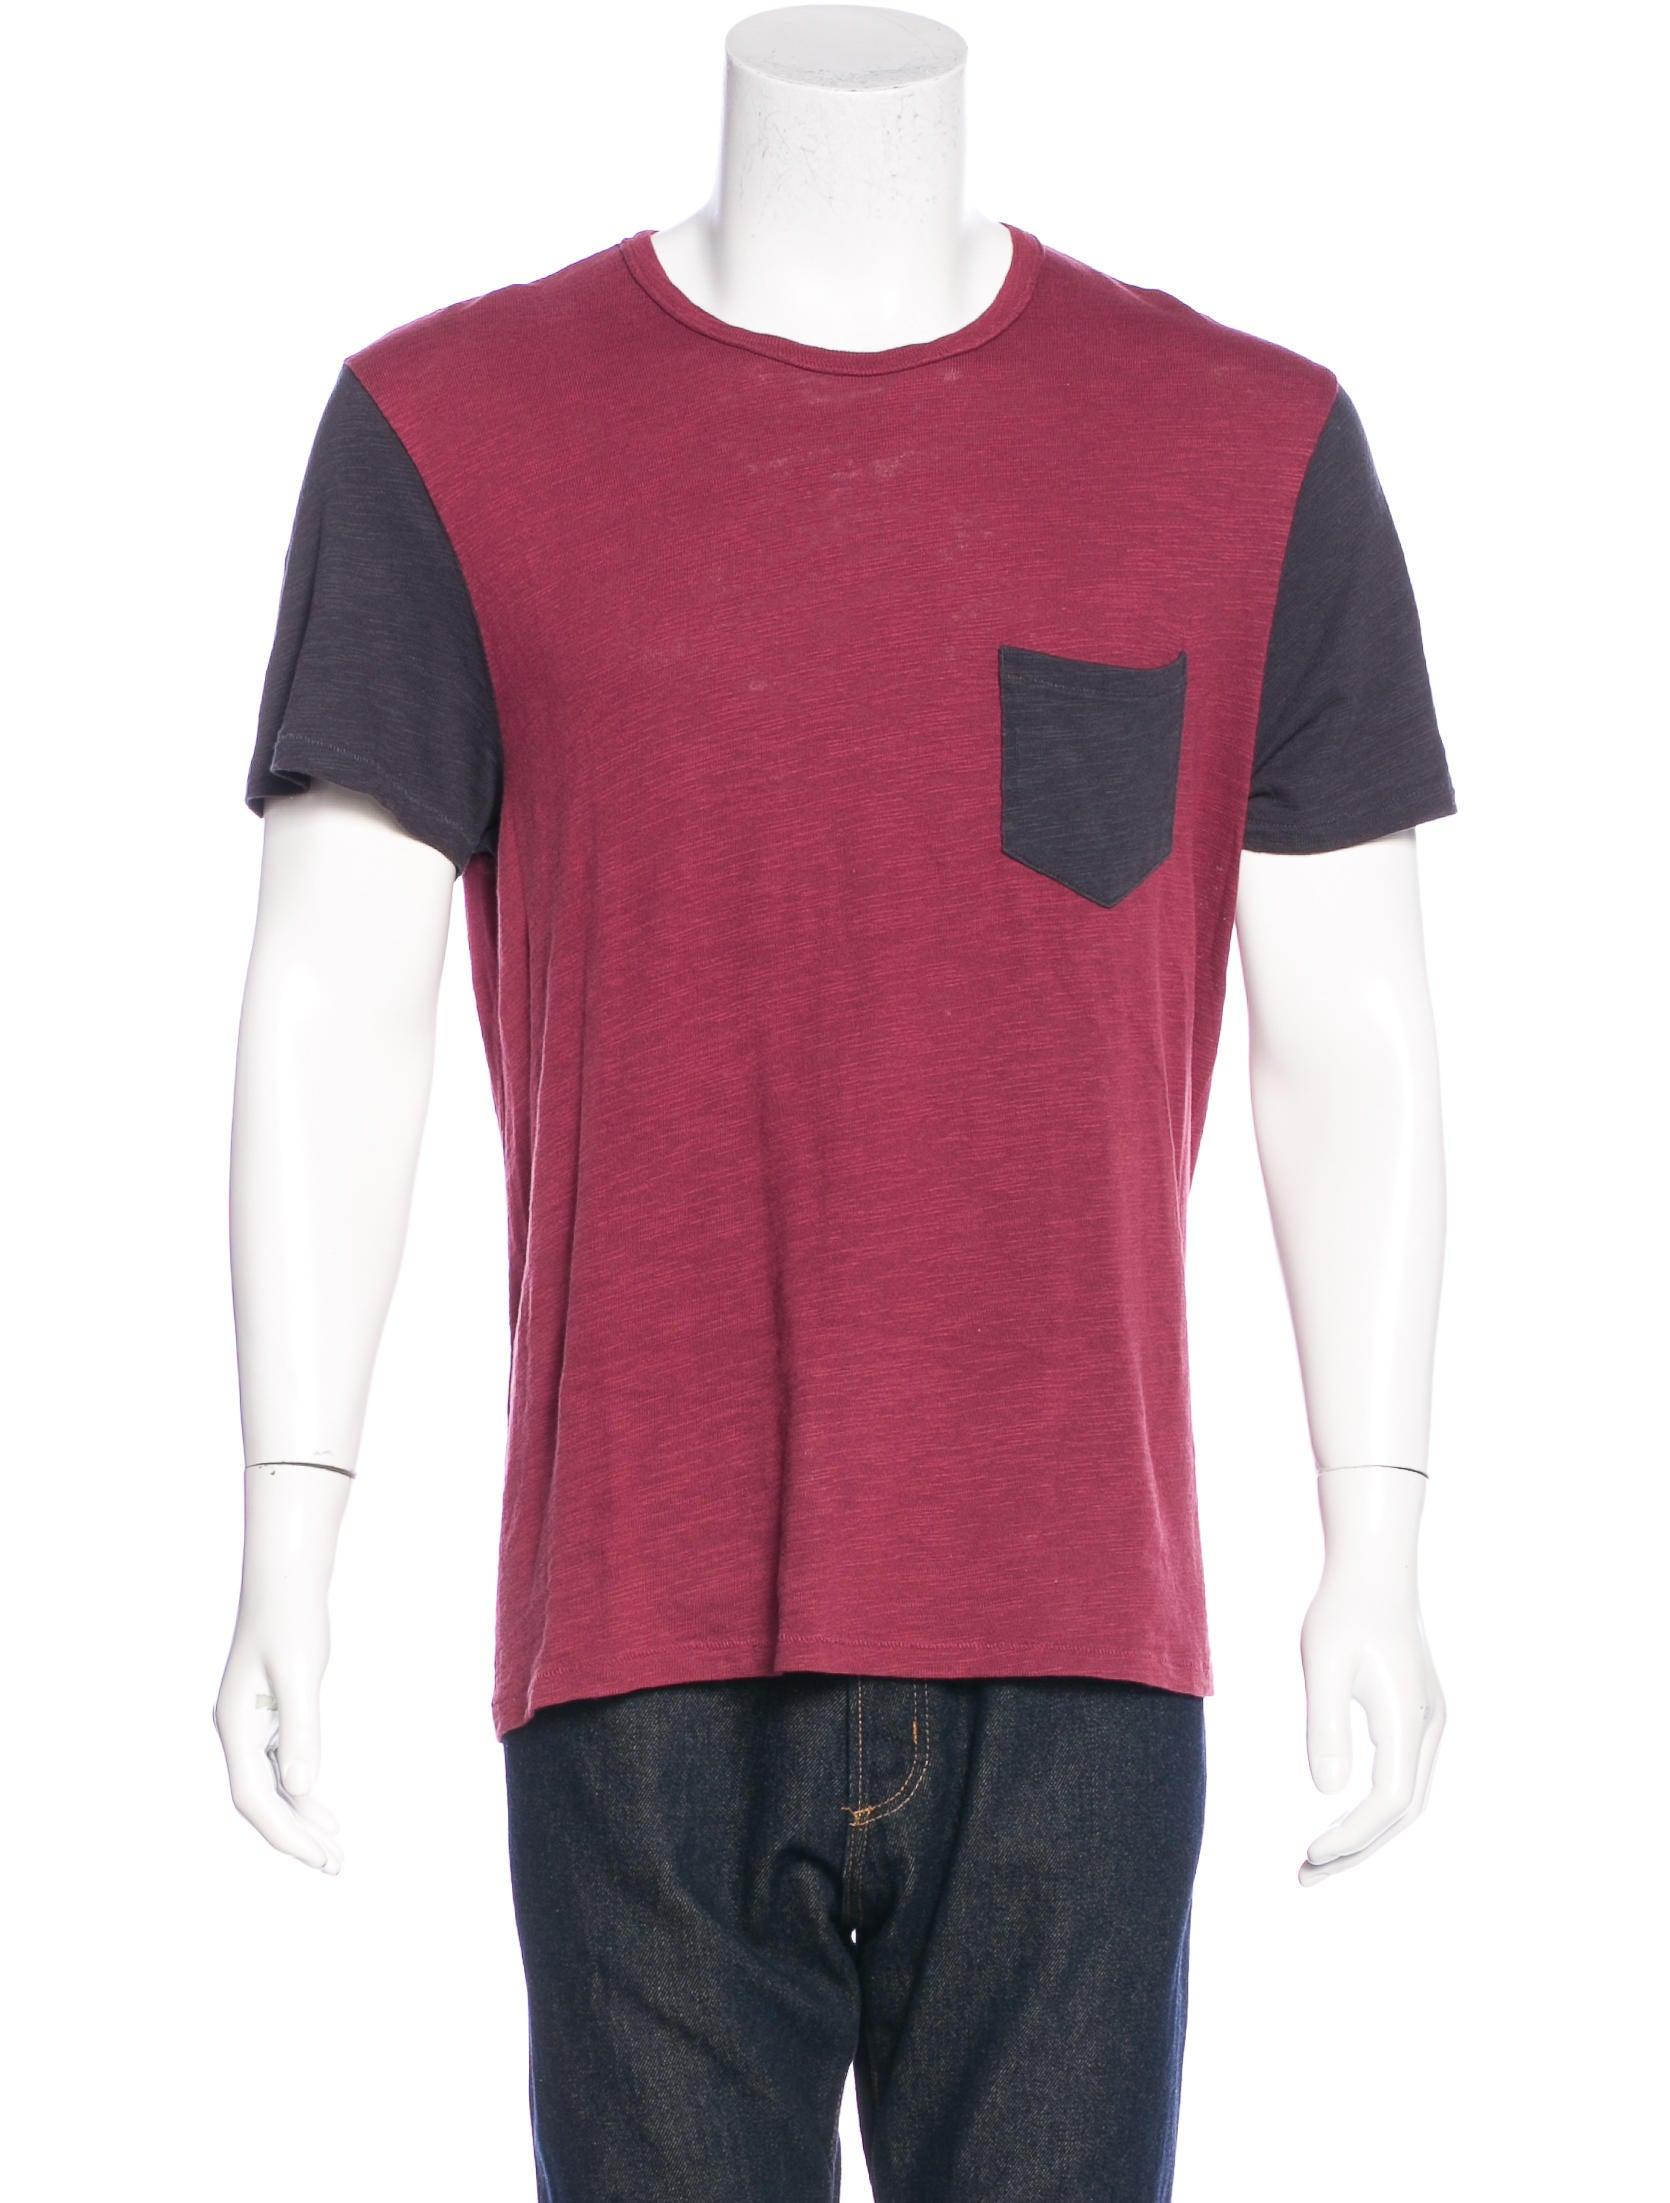 Rag Bone Contrast Pocketed T Shirt Clothing